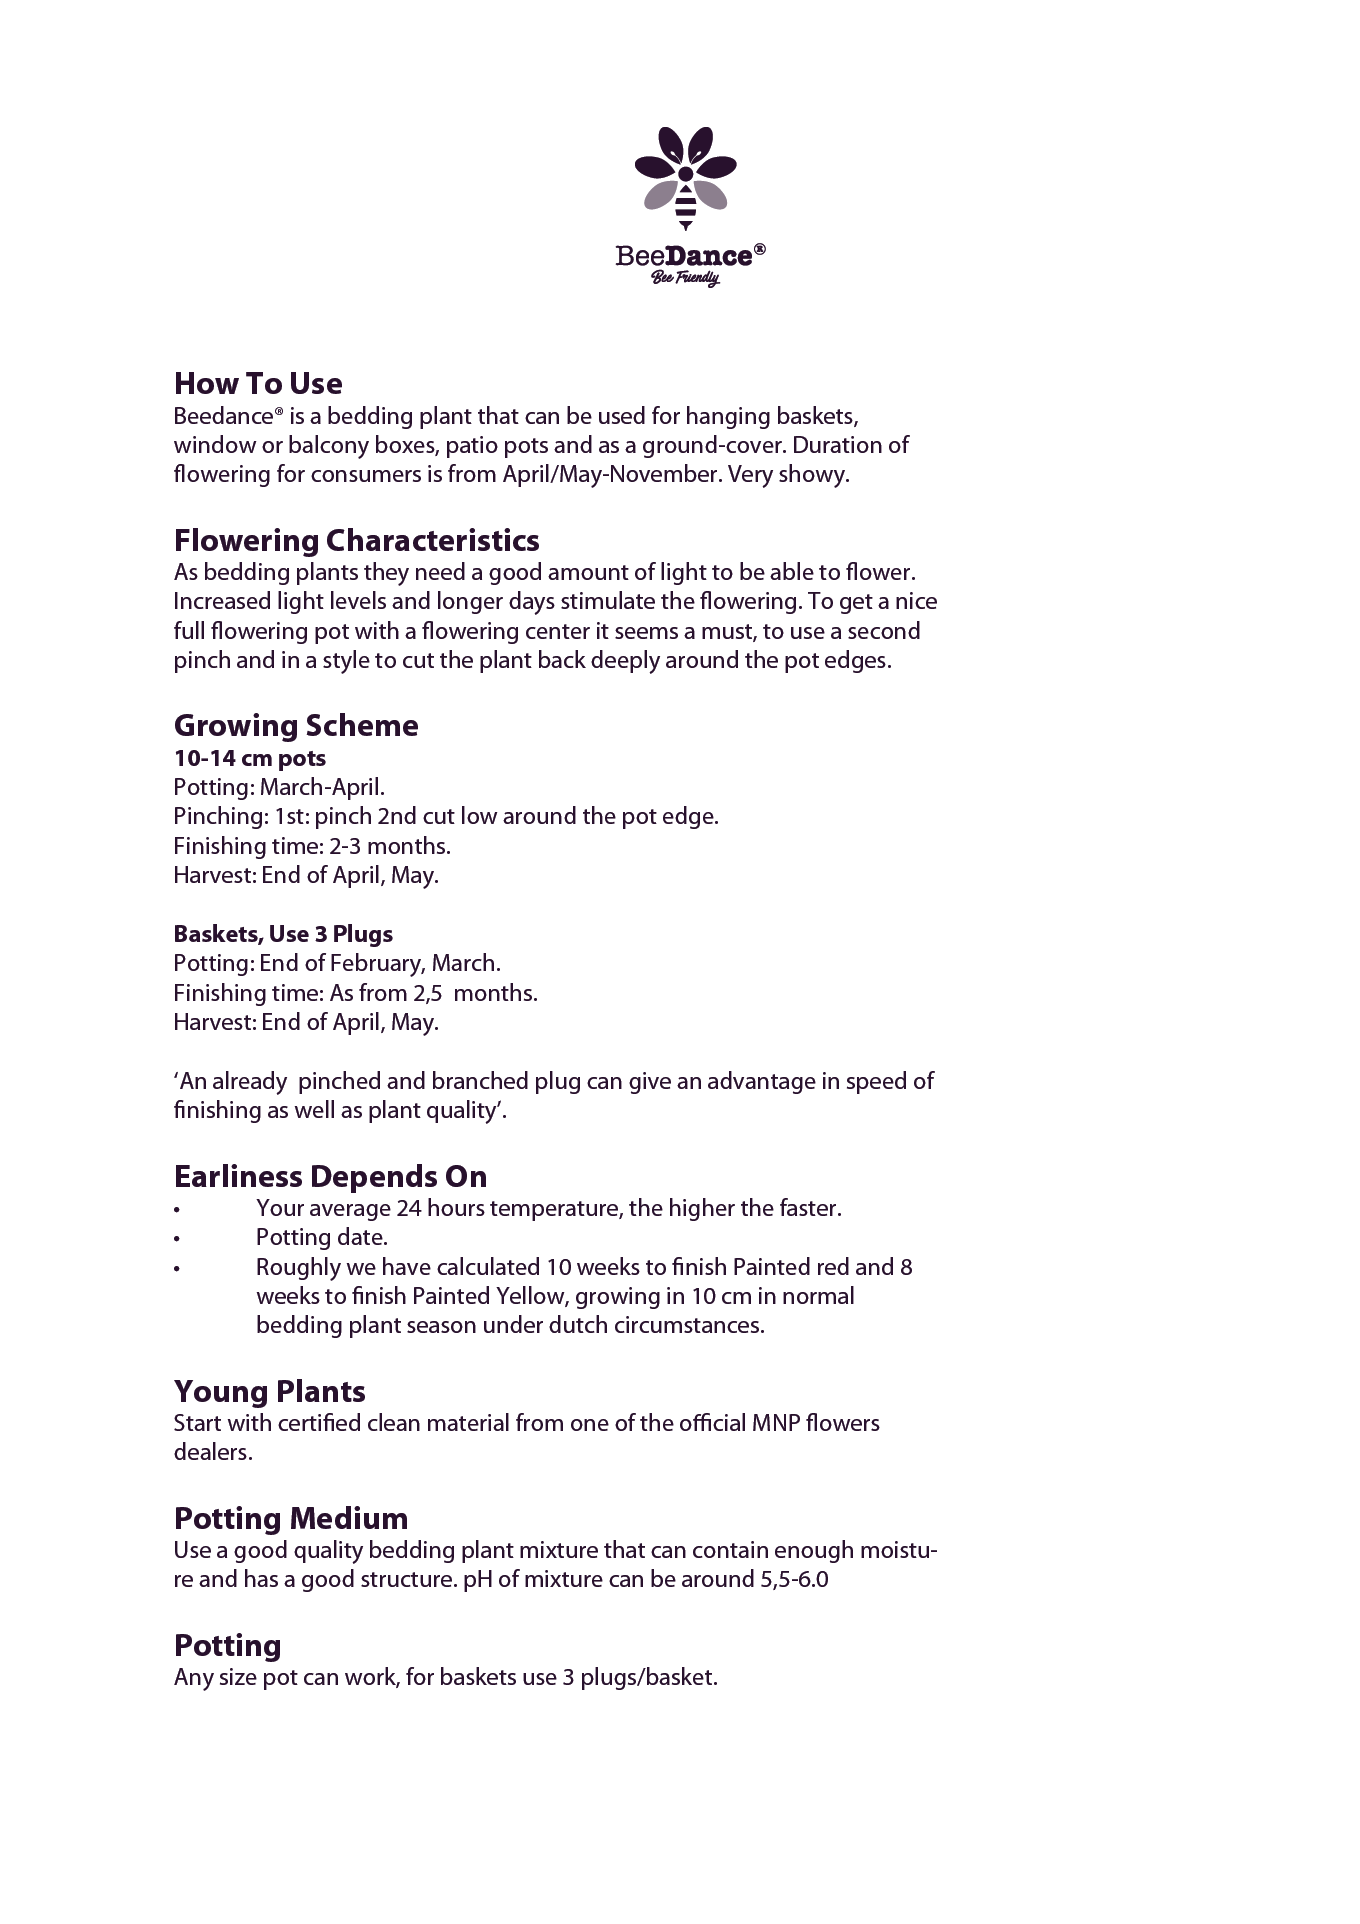 beedance cultural info